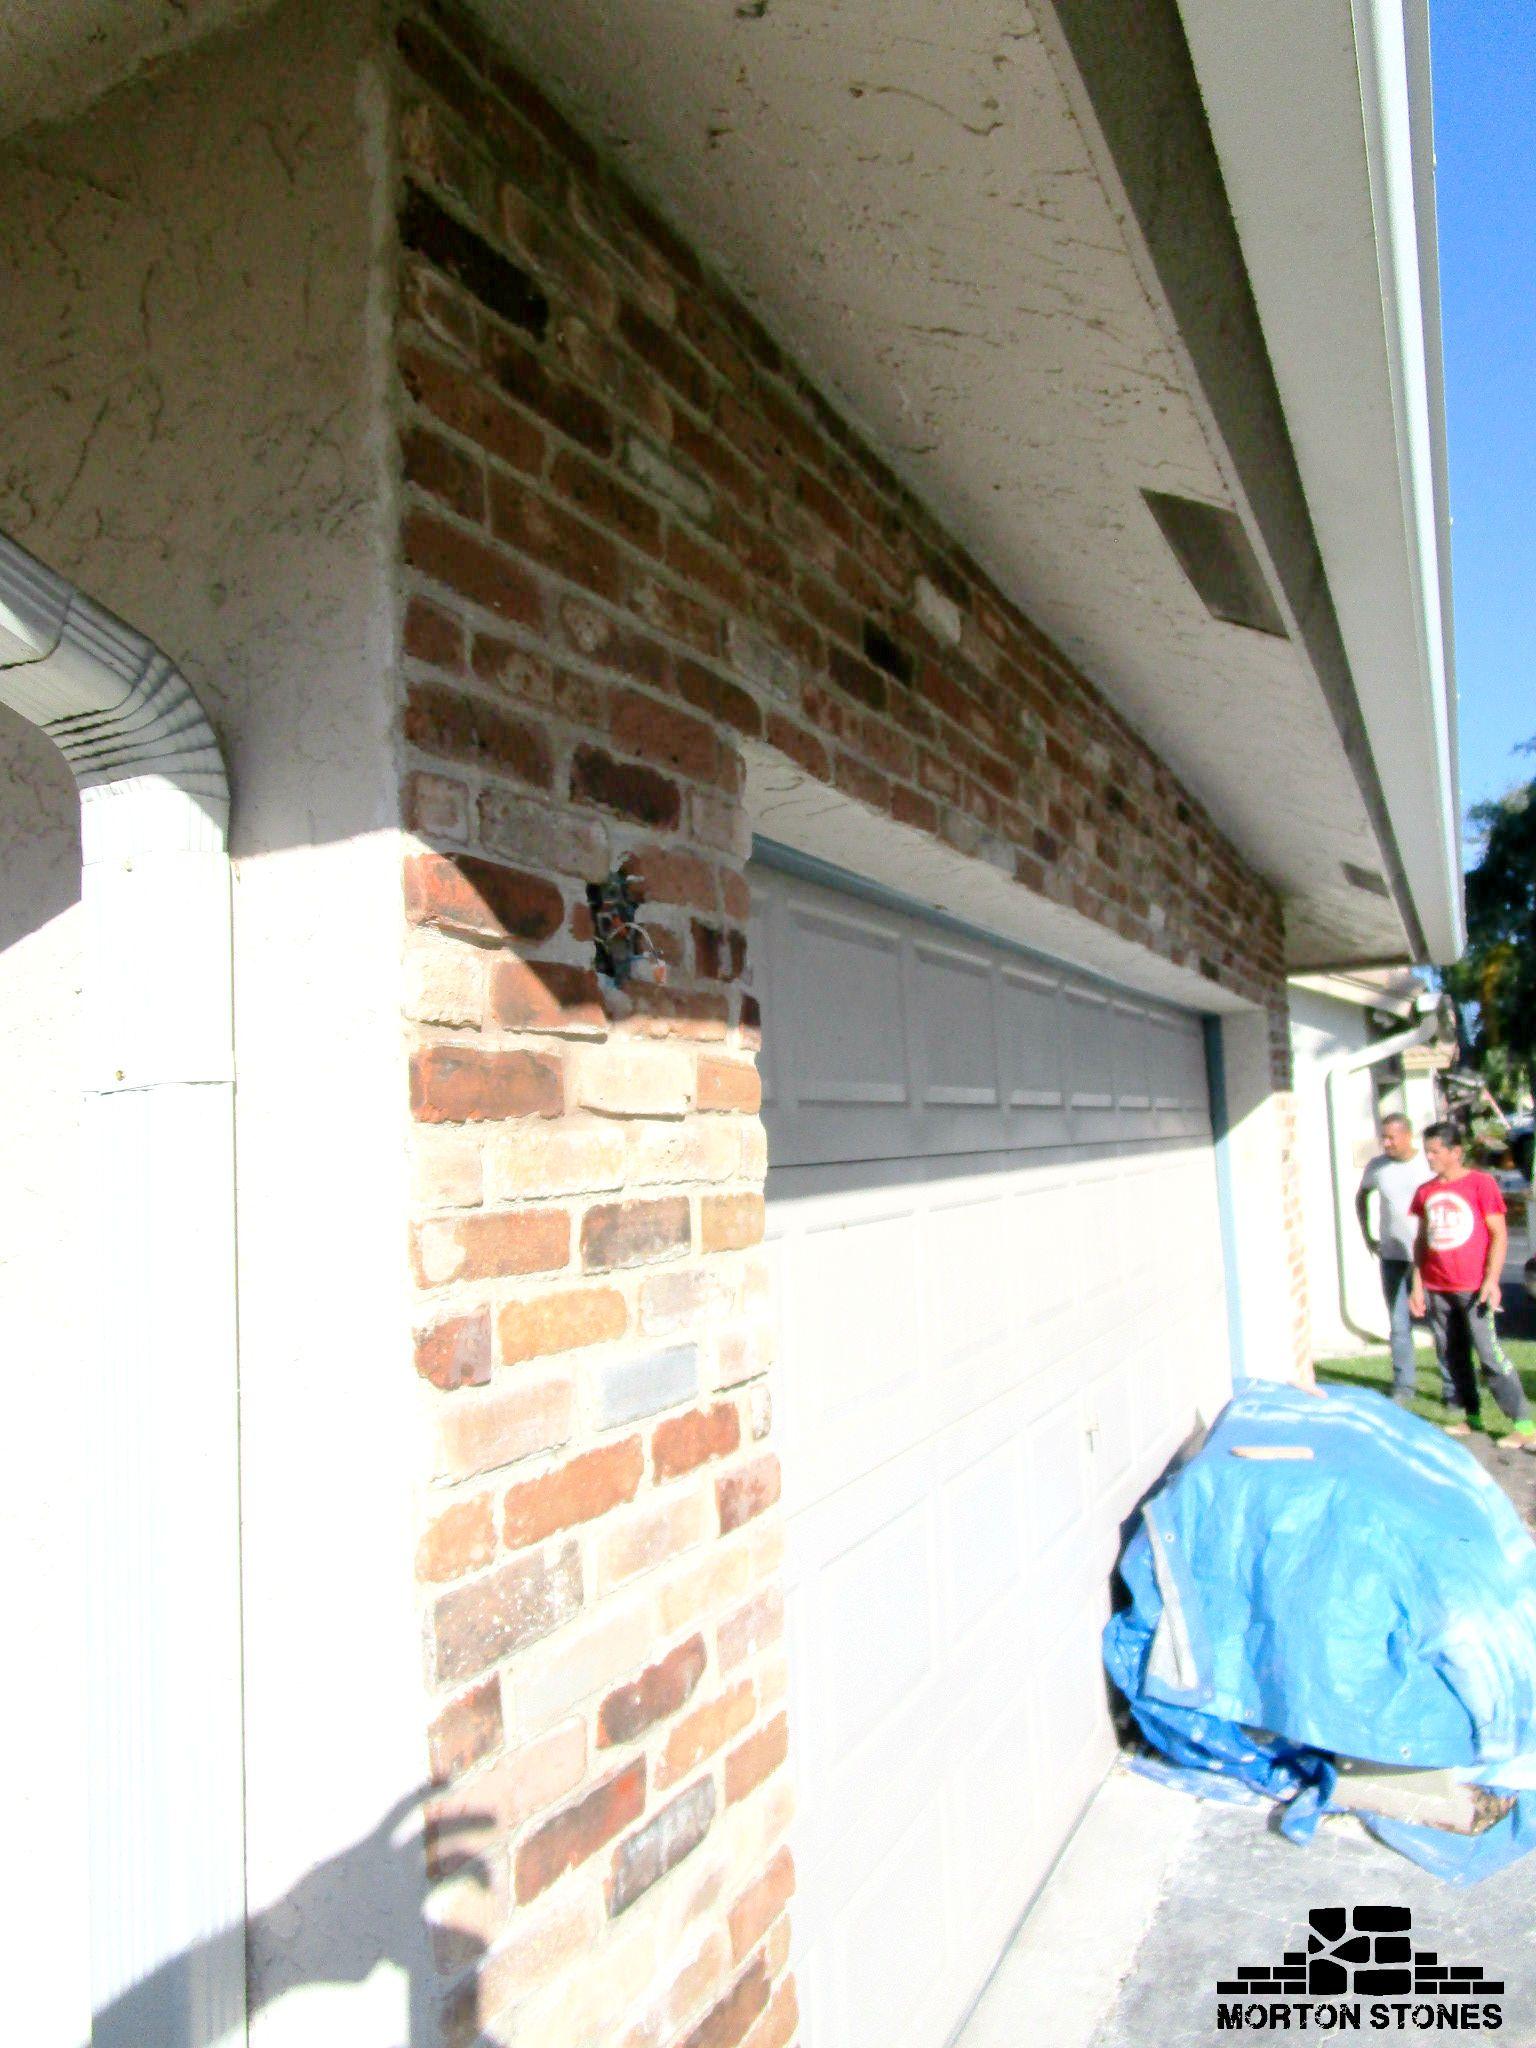 Installation Of Brick Veneers On A Garage Wall Mortonstones Brick Tiles Home Decor Brickveneer Exterior Thinbric Brick Veneer Garage Walls Thin Brick